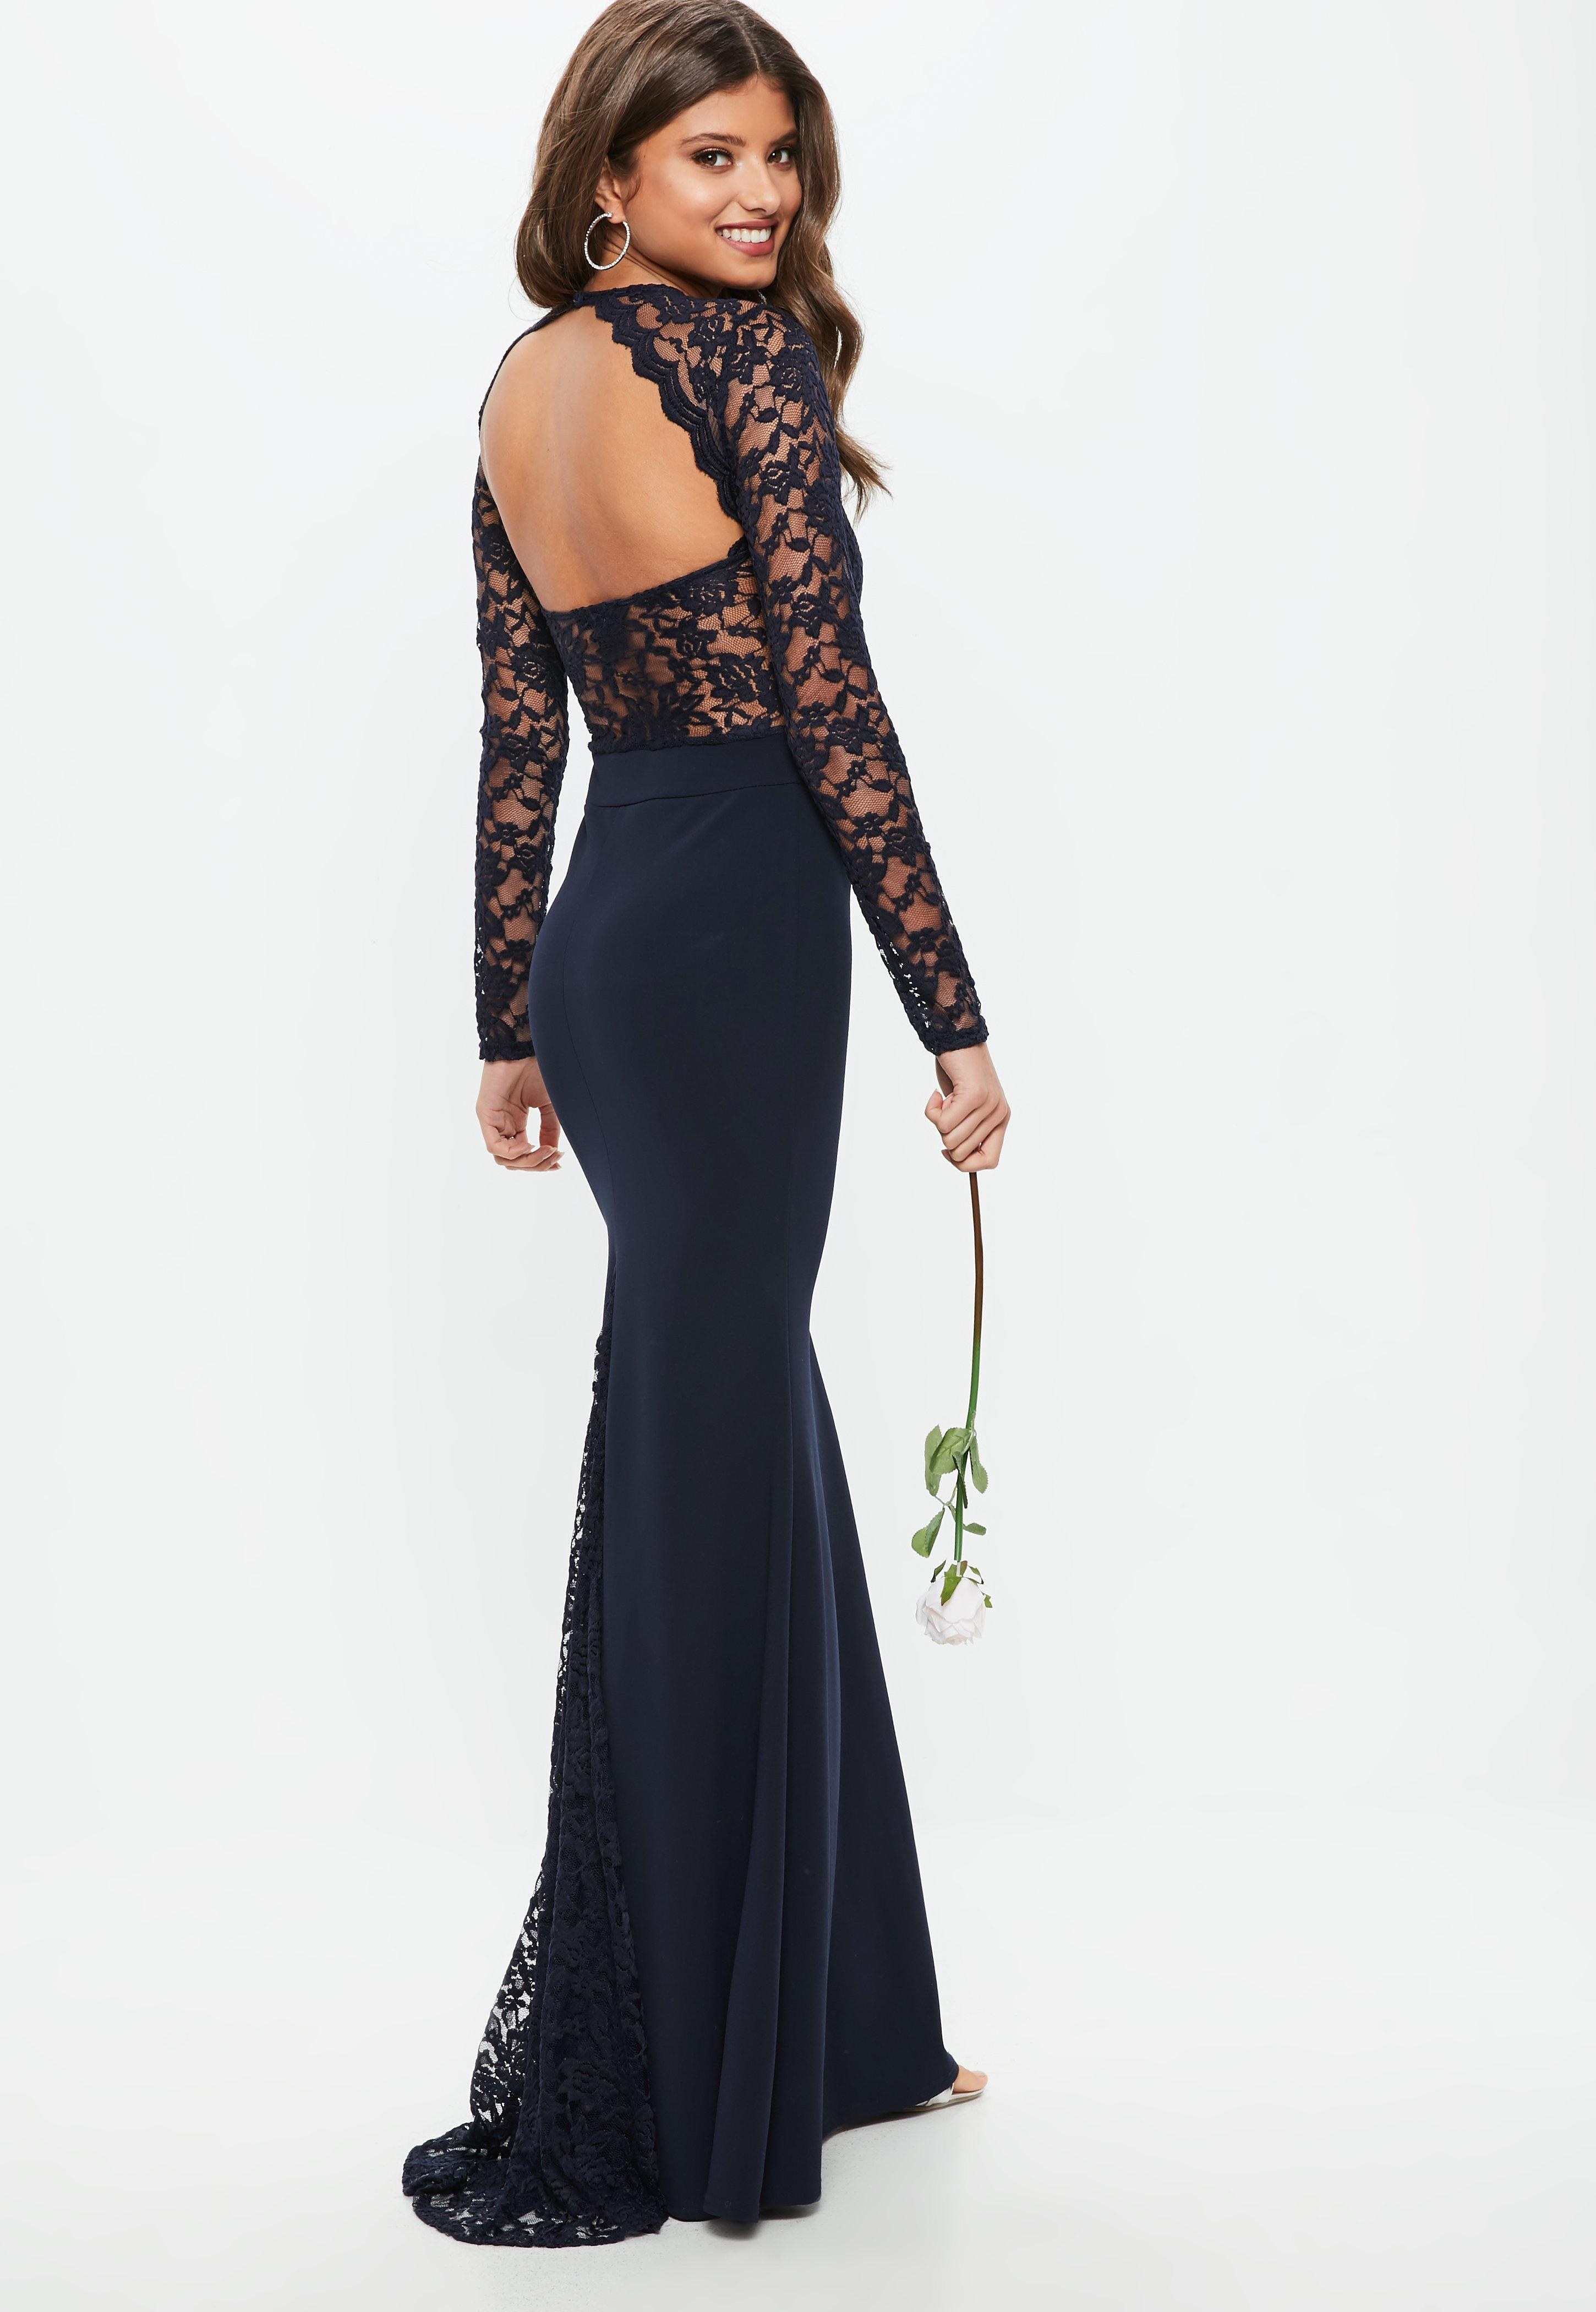 Prom Dresses | Formal Dresses UK - Missguided